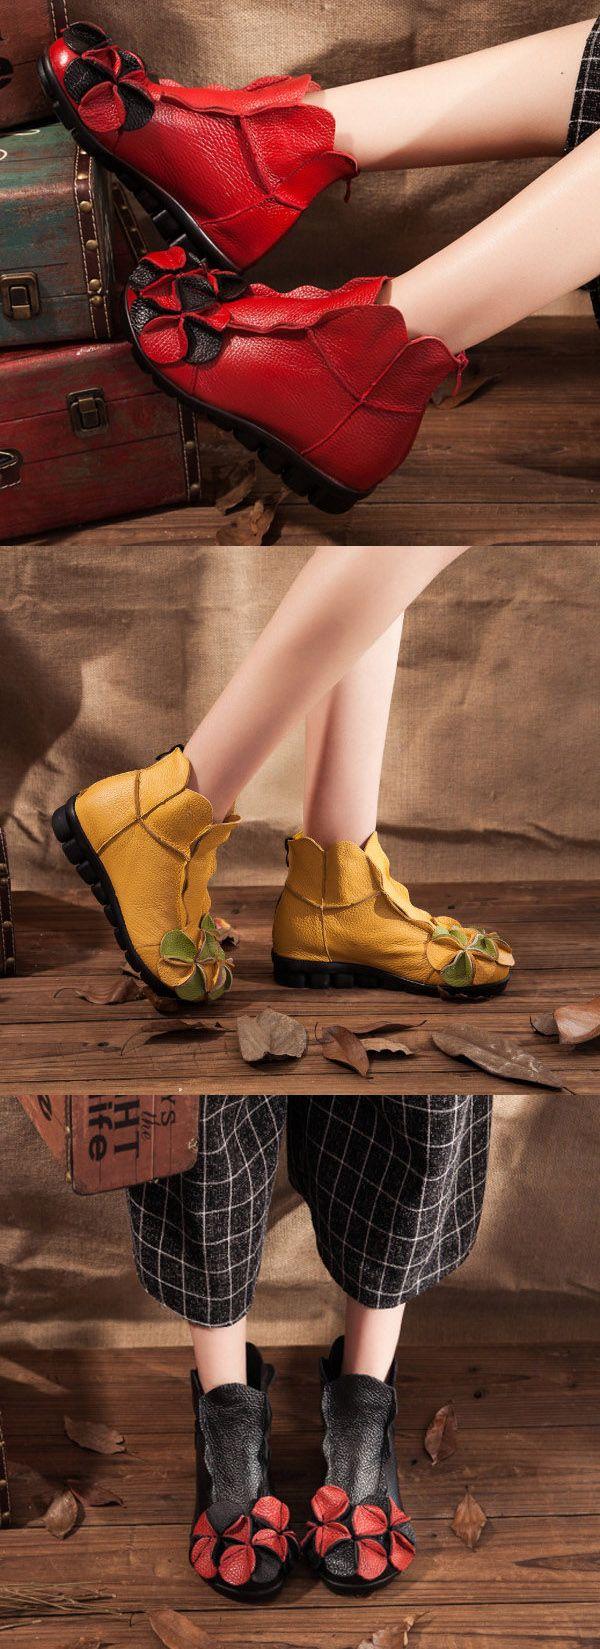 $29.68 Socofy Flower Soft Leather Ankle Vintage Slip On Flat Boots